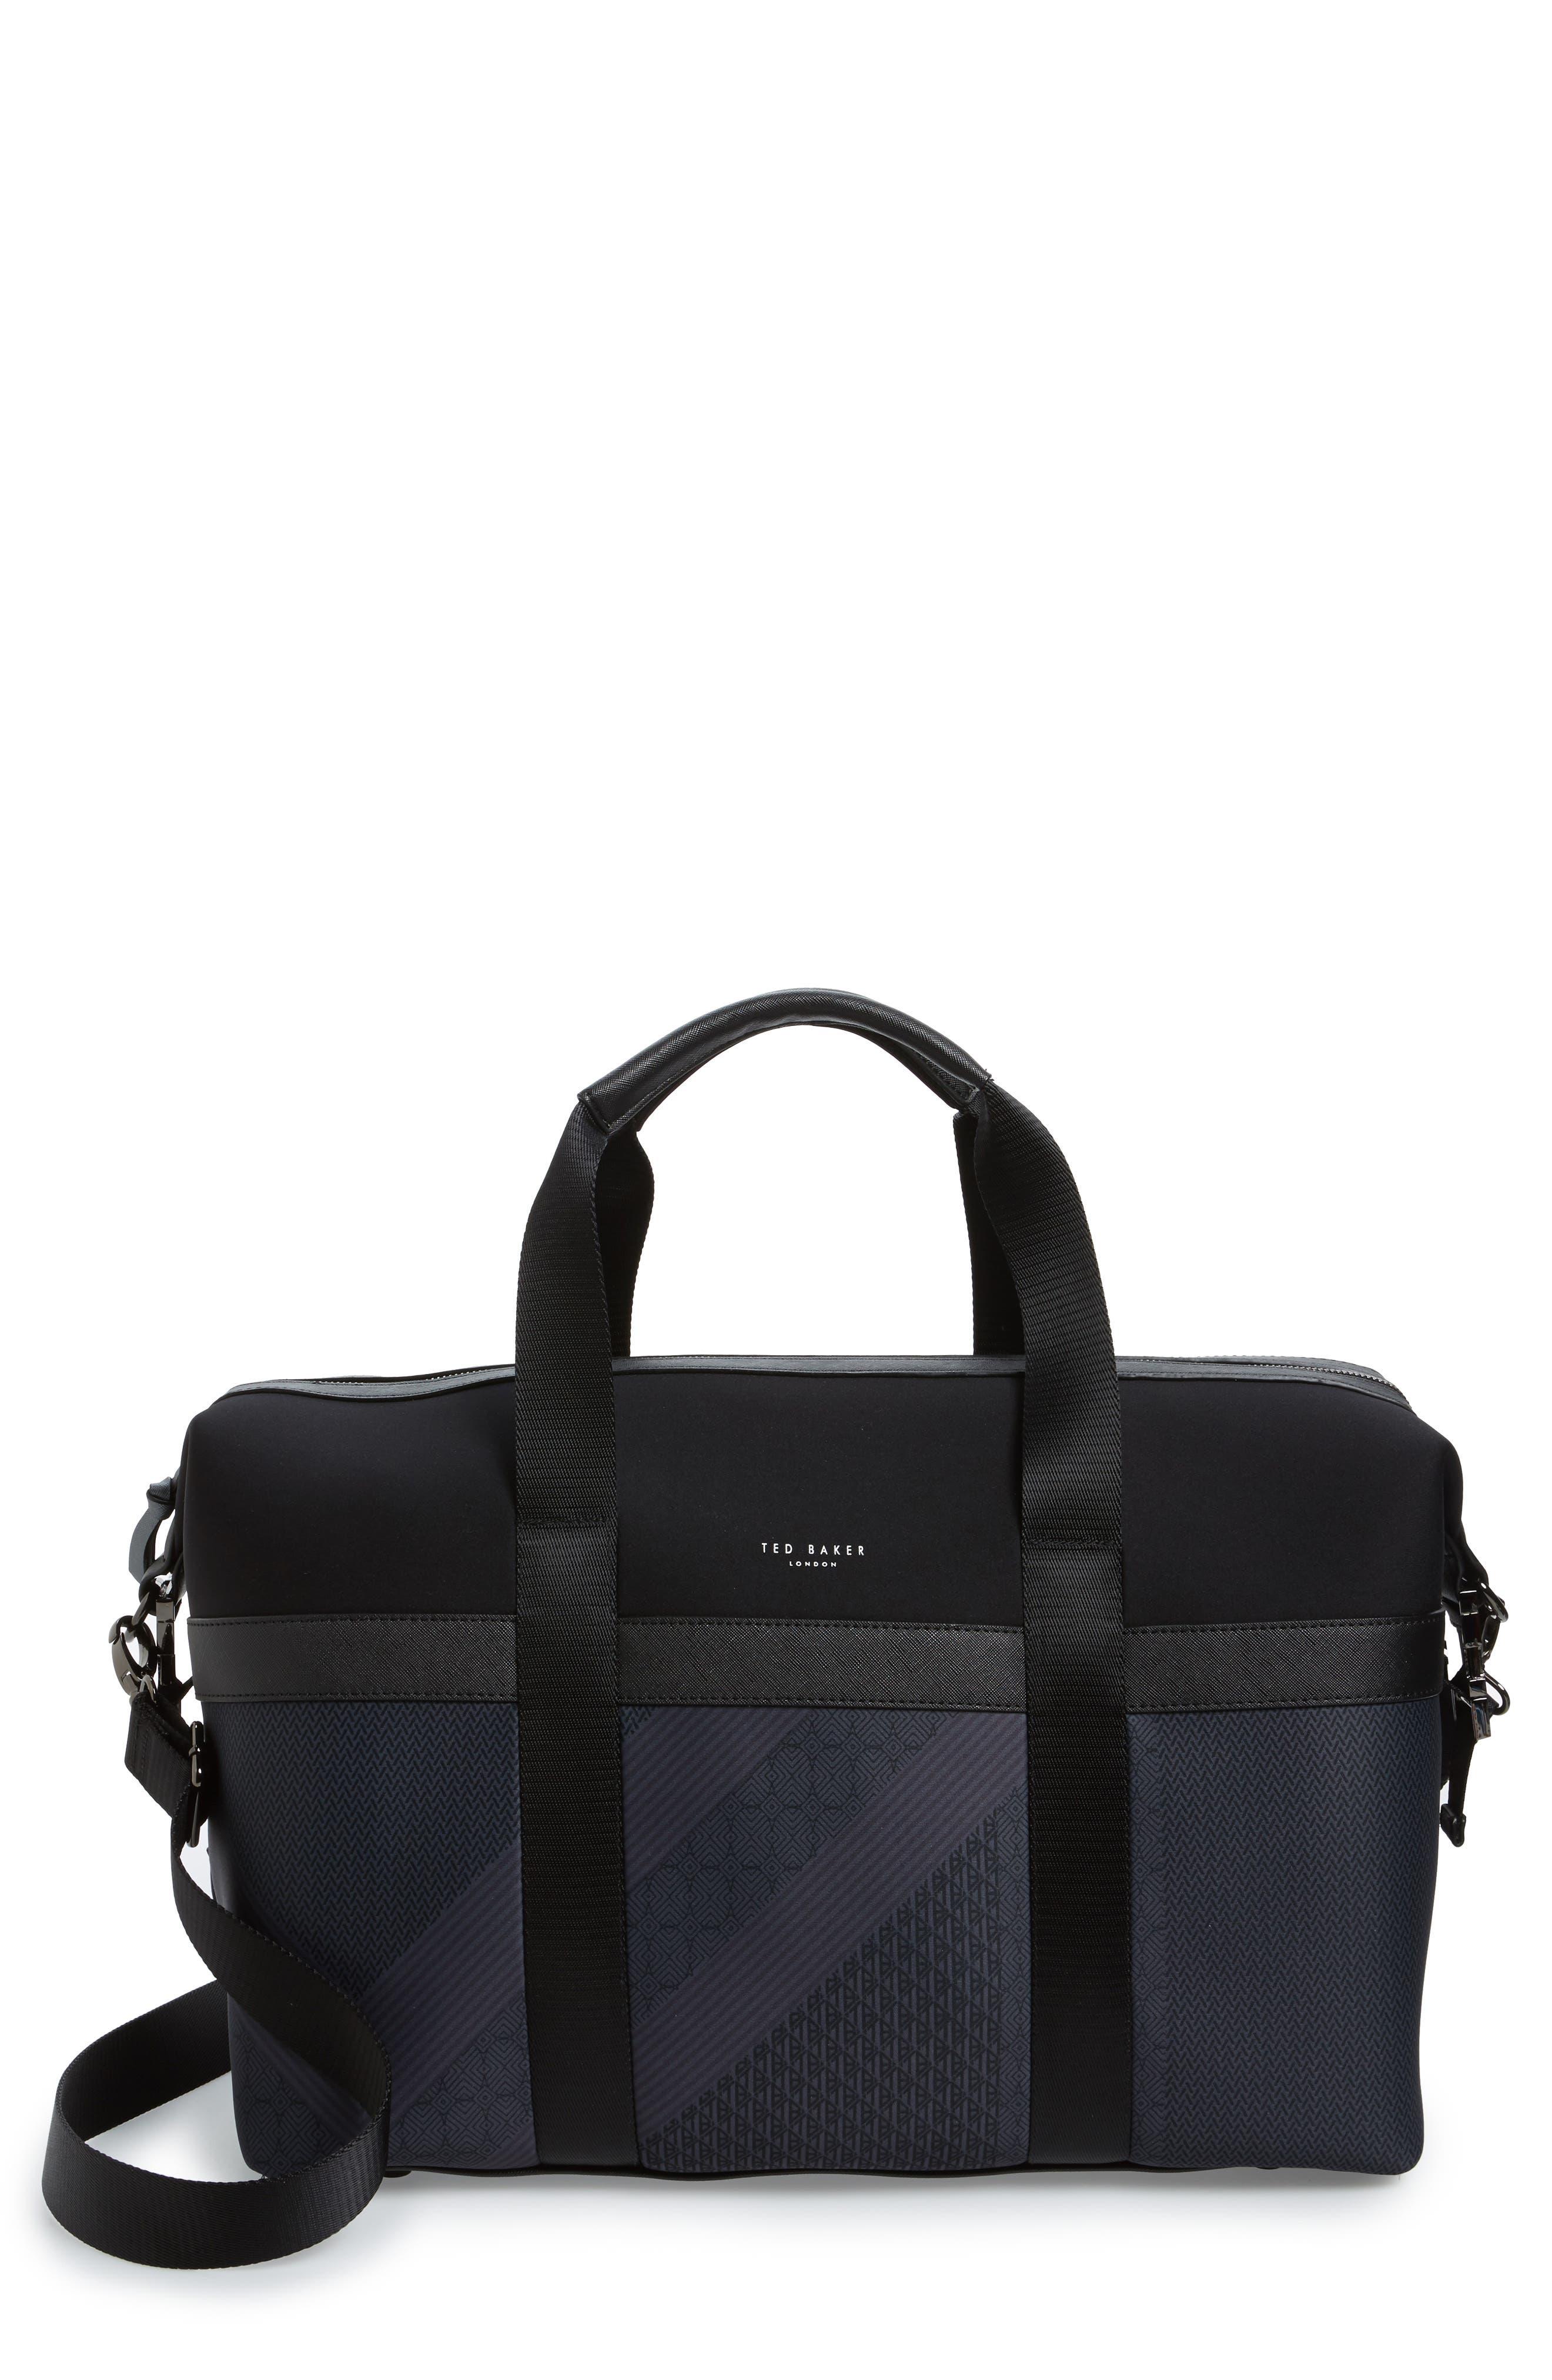 Scuba Duffel Bag,                         Main,                         color, 001